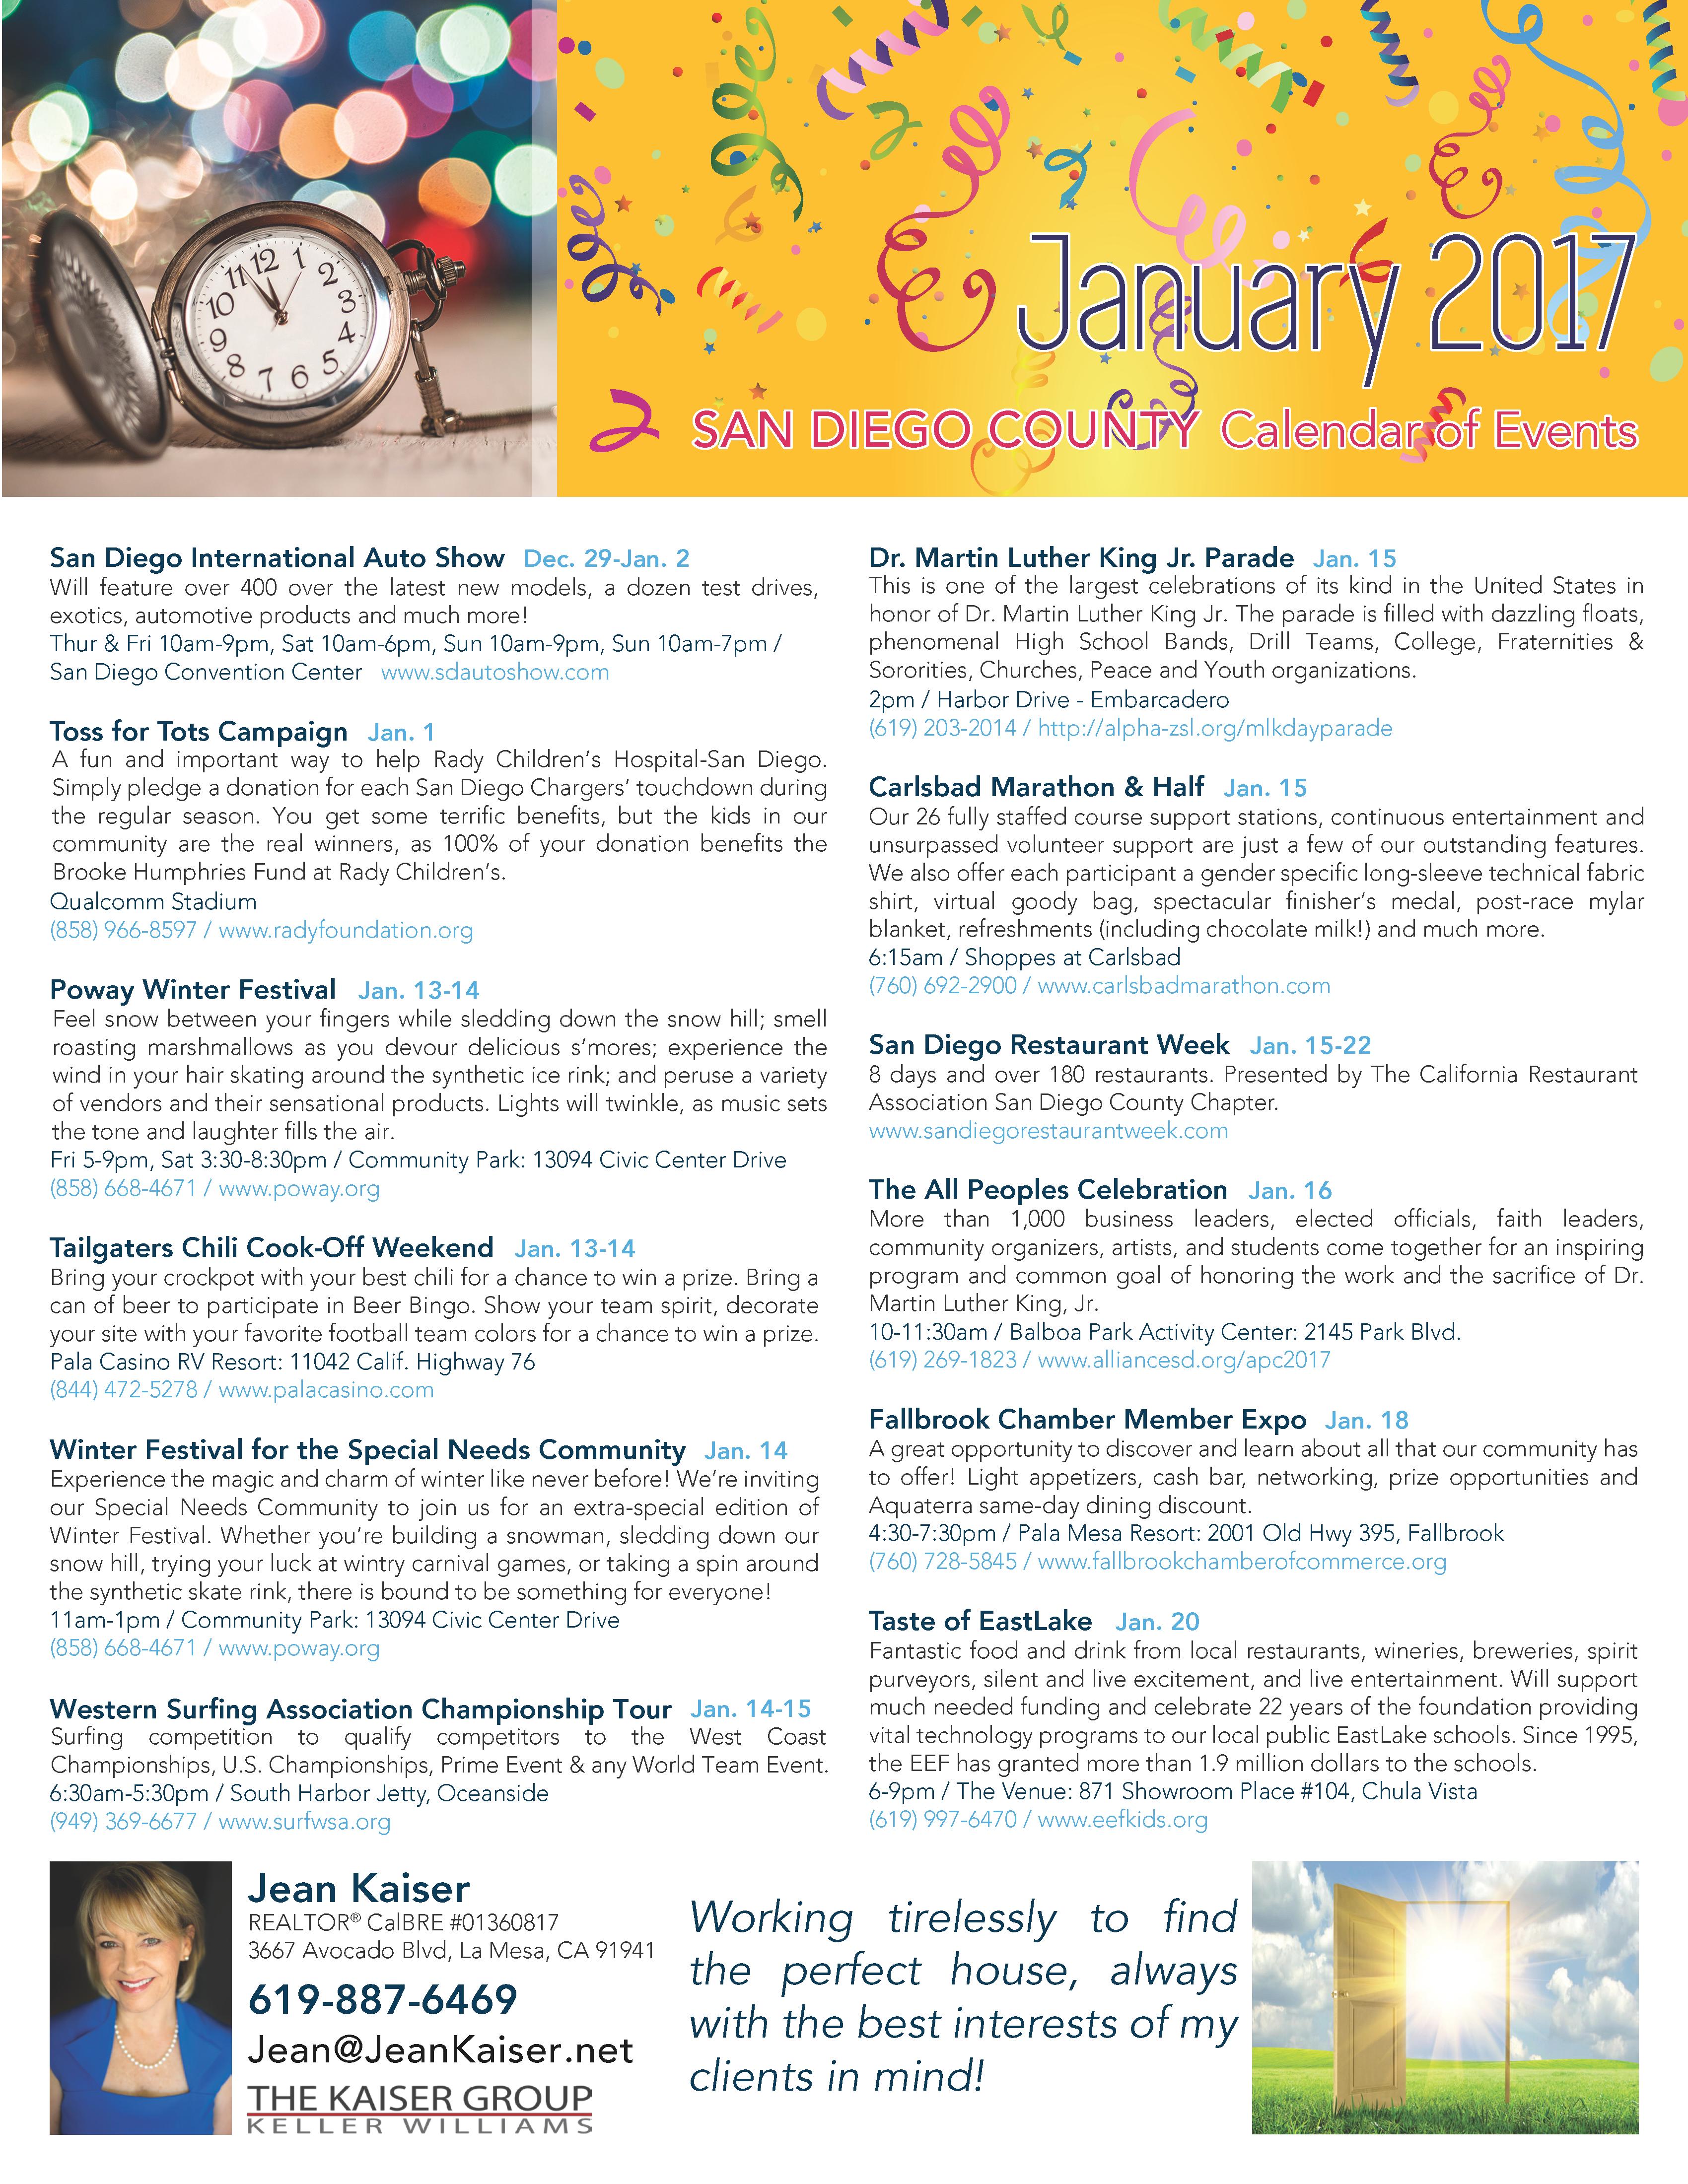 January 2017 San Diego Events